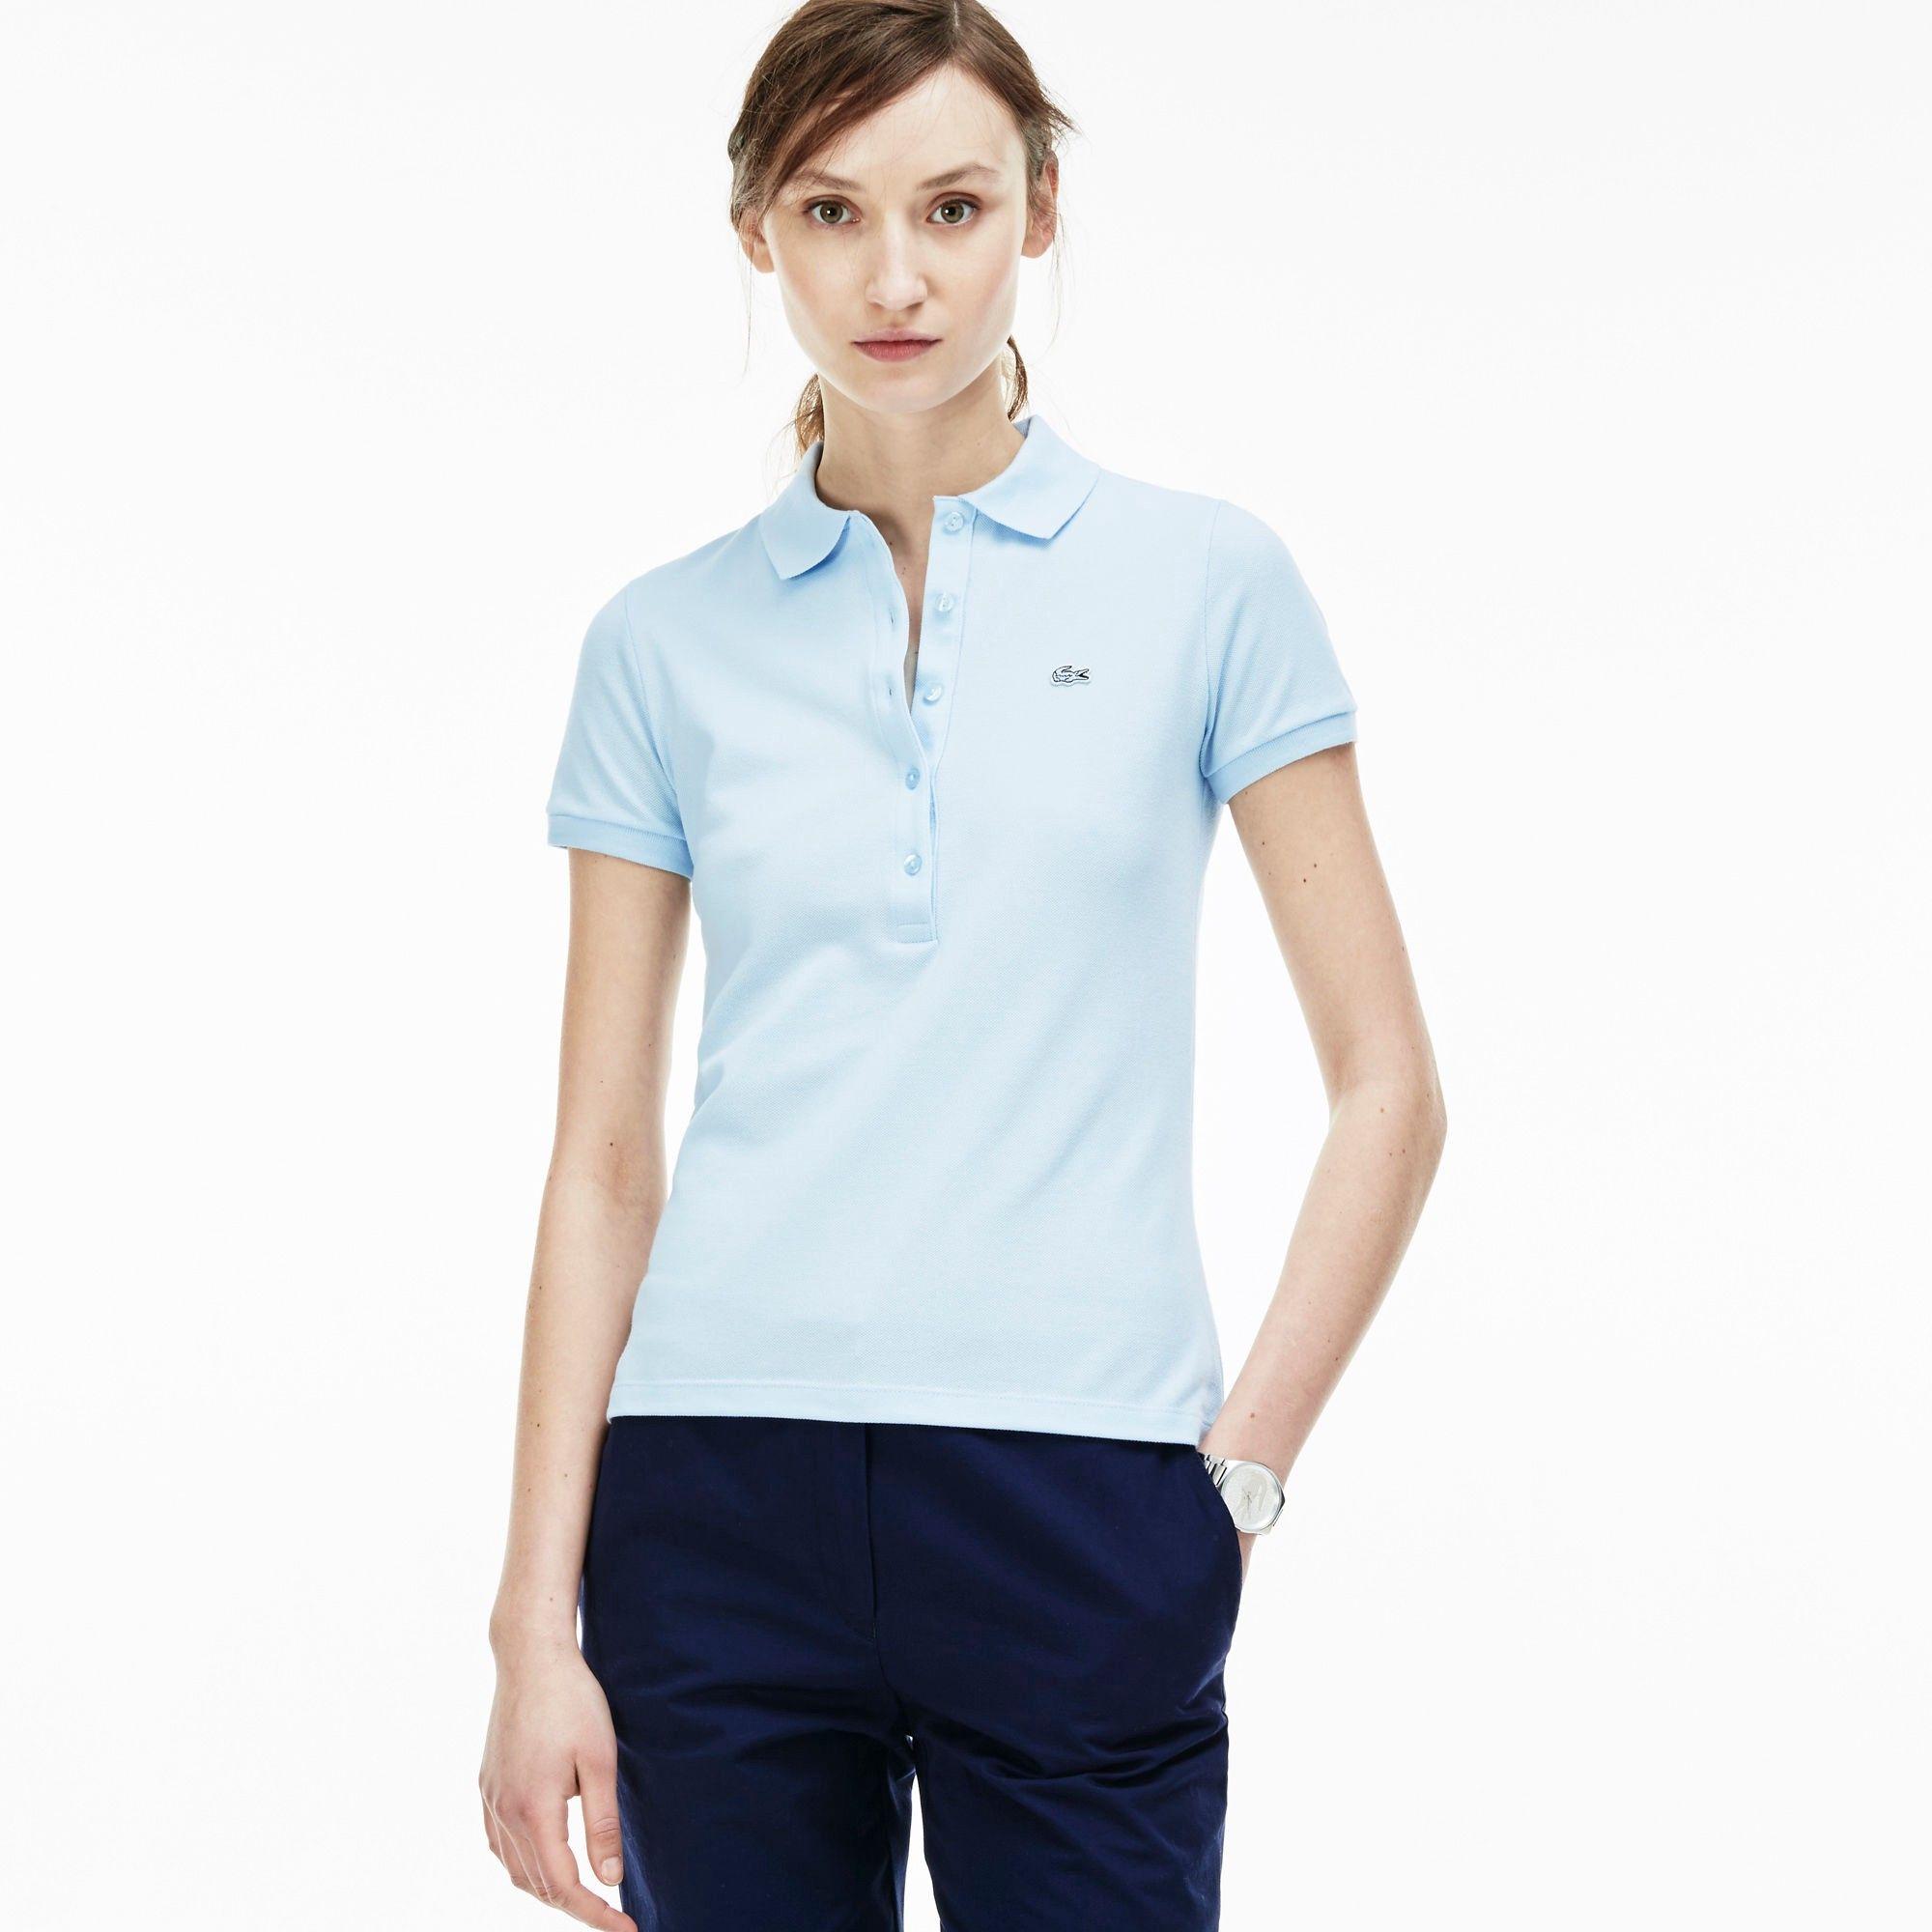 f38a5c58 LACOSTE Women'S Slim Fit Stretch Piqué Polo Shirt - Rill. #lacoste ...